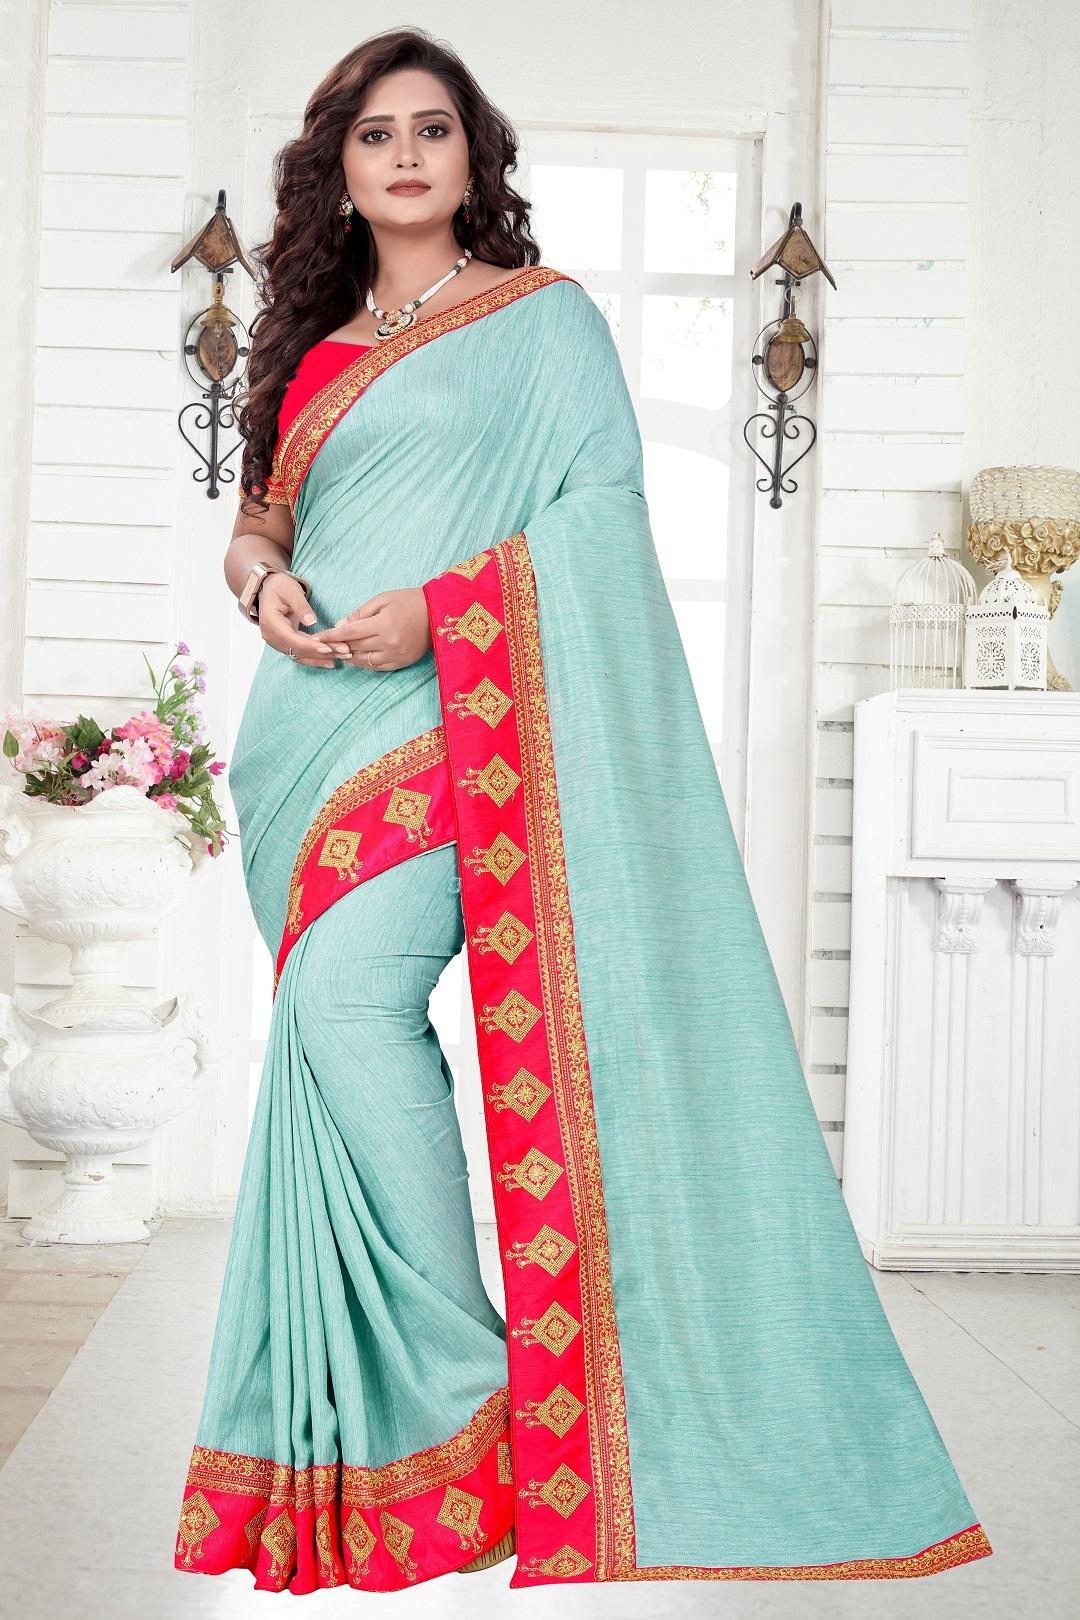 Designer Assam Silk Saree